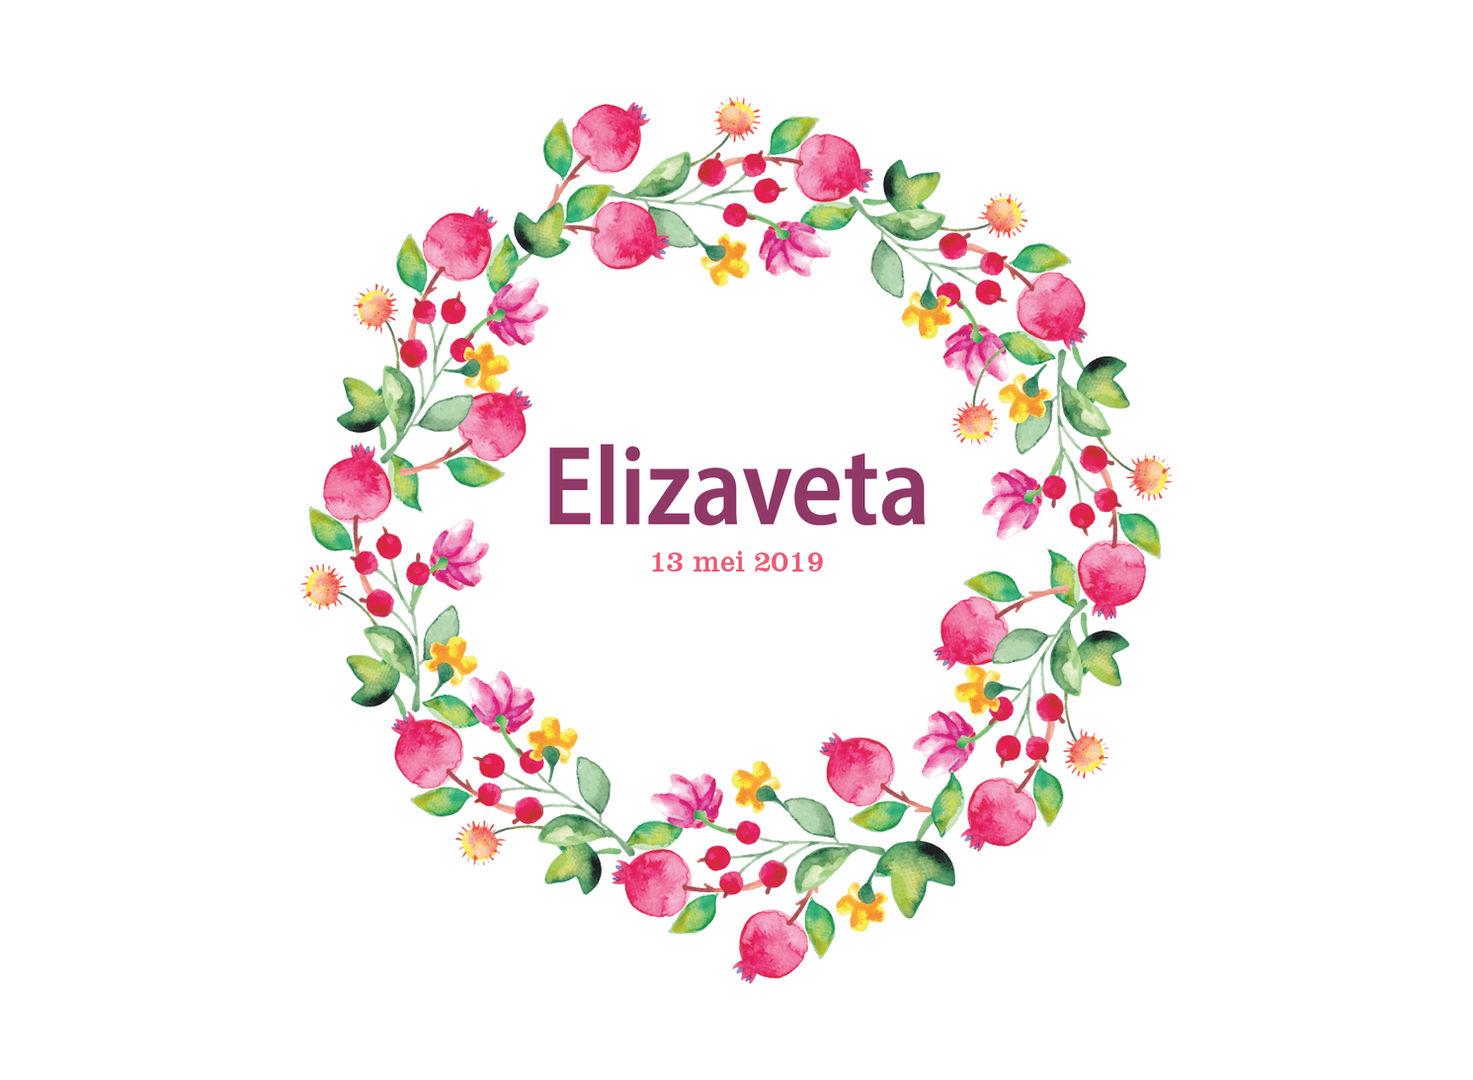 Overzicht Elizaveta-02.jpg